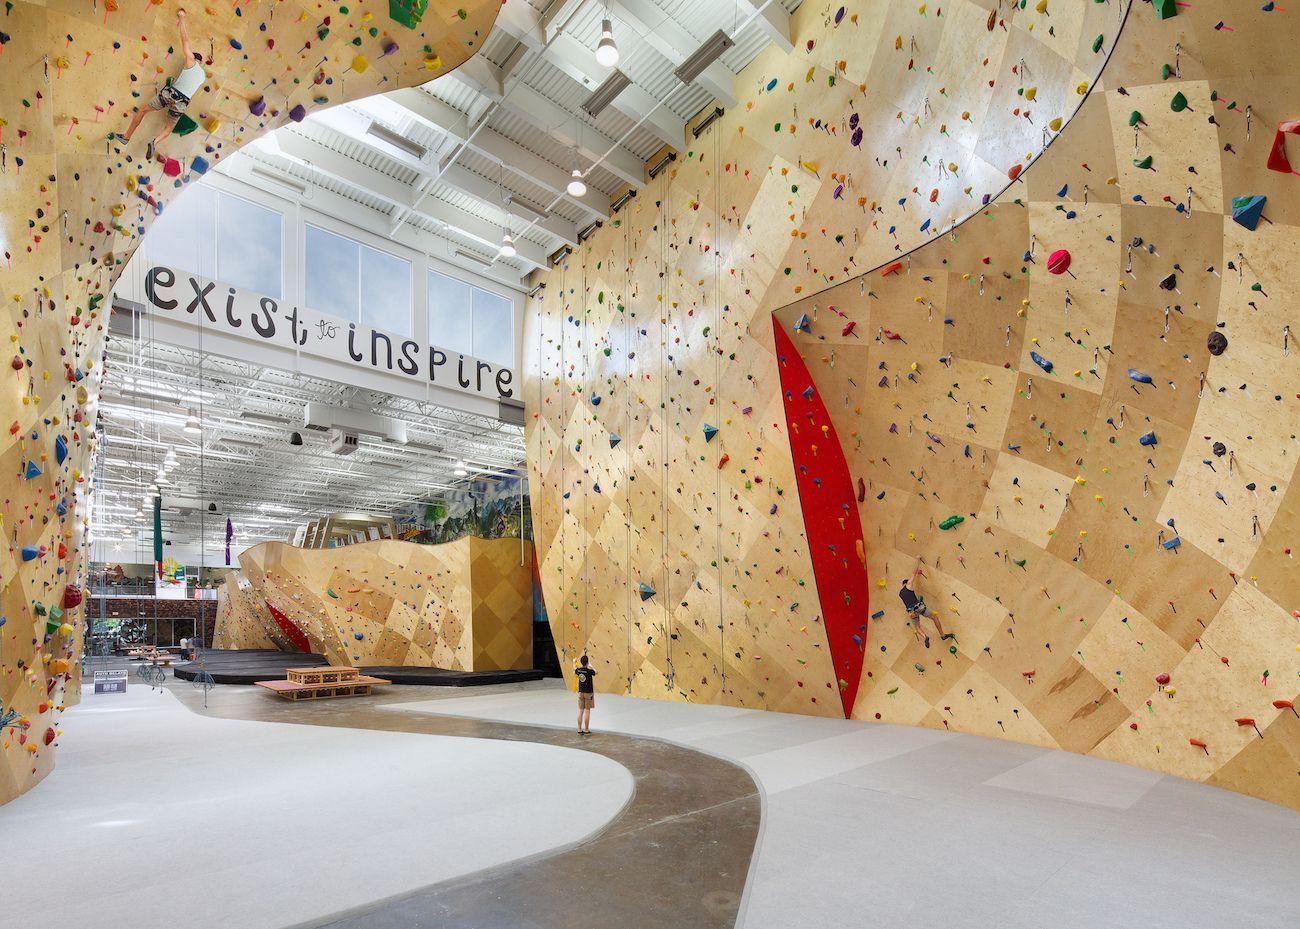 Du Coworking Et De L Escalade Que Demander De Plus A Brooklyn Boulders New York L Adhesion Donne Acces A La Climbing Wall Rock Climbing Wall Climbing Gym